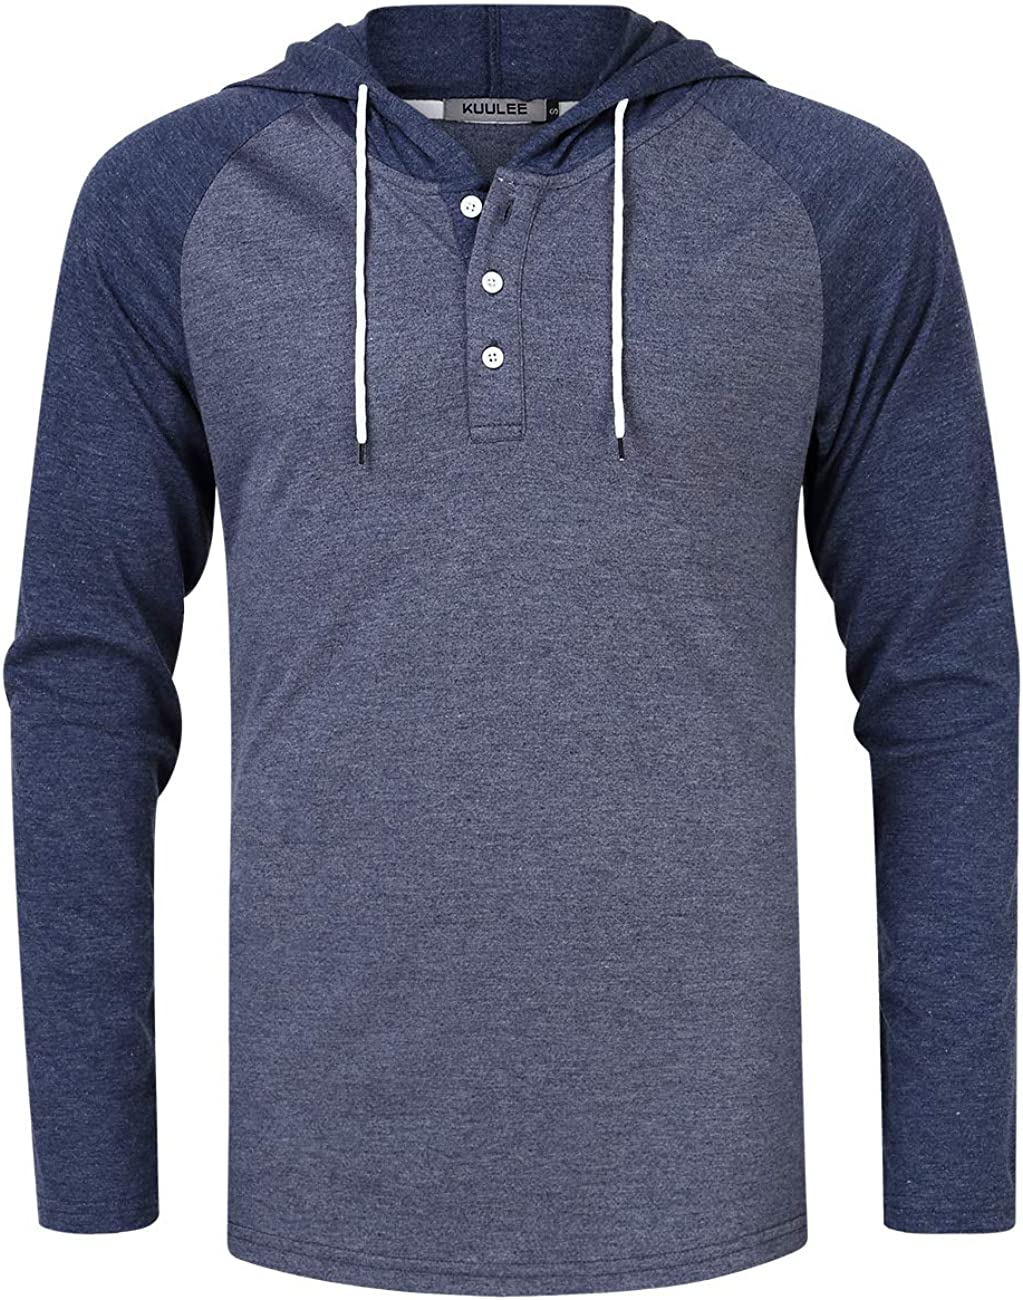 KUULEE Men's Long Sleeve Raglan Henley Jersey Hoodie Shirt